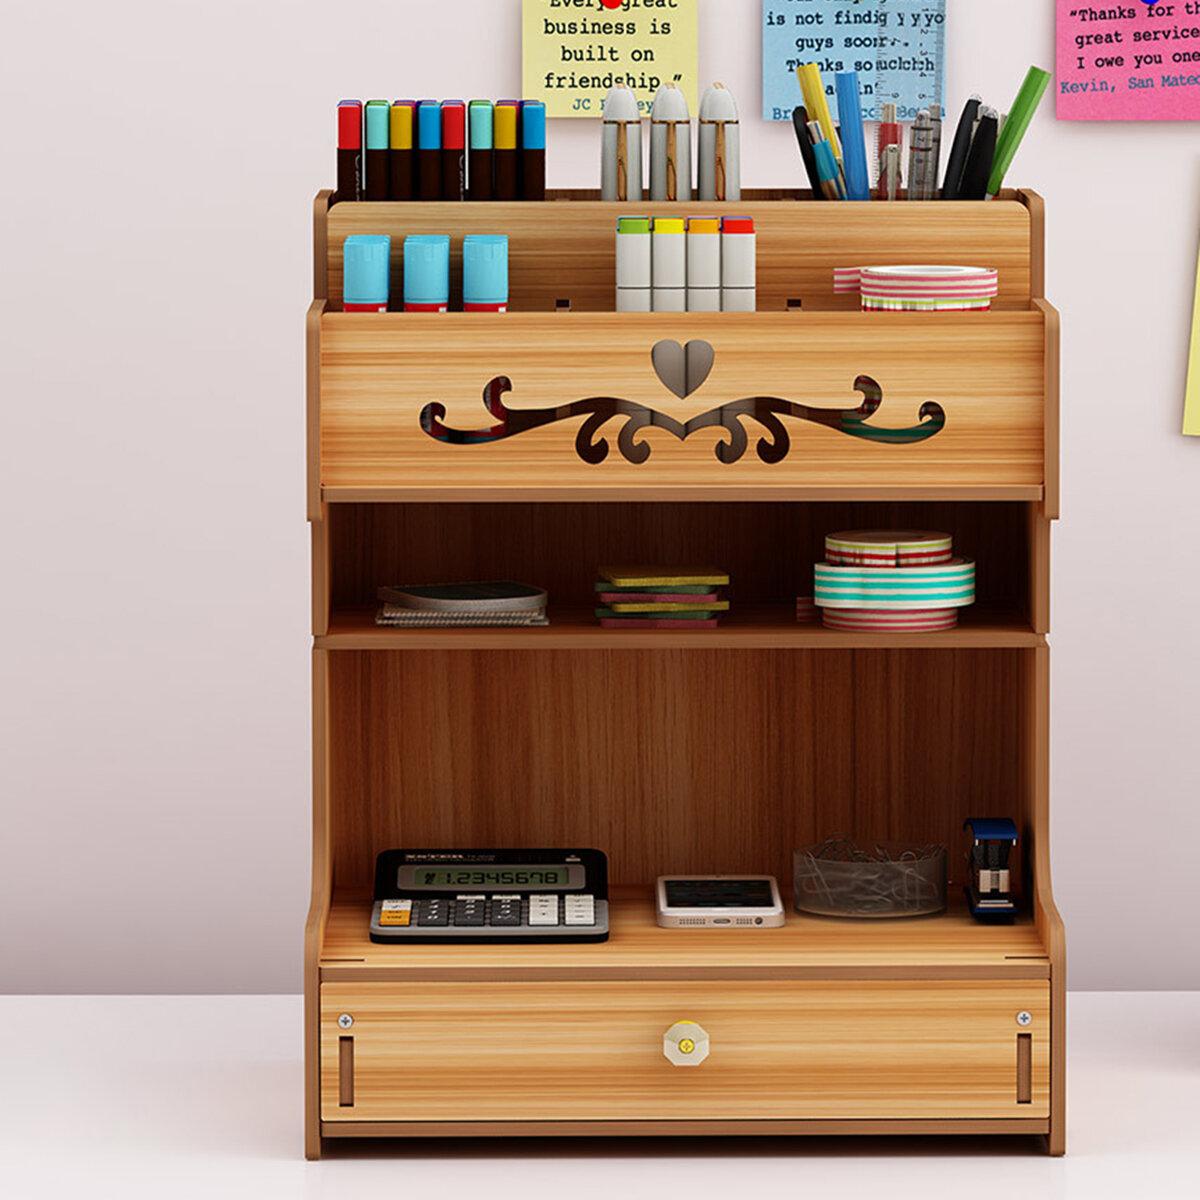 Wooden Desk Organizer Multi_Functional DIY Pen Holder Box Cell Phone Holder Desktop Stationary Home Office Supplies Storage Rack with Drawer